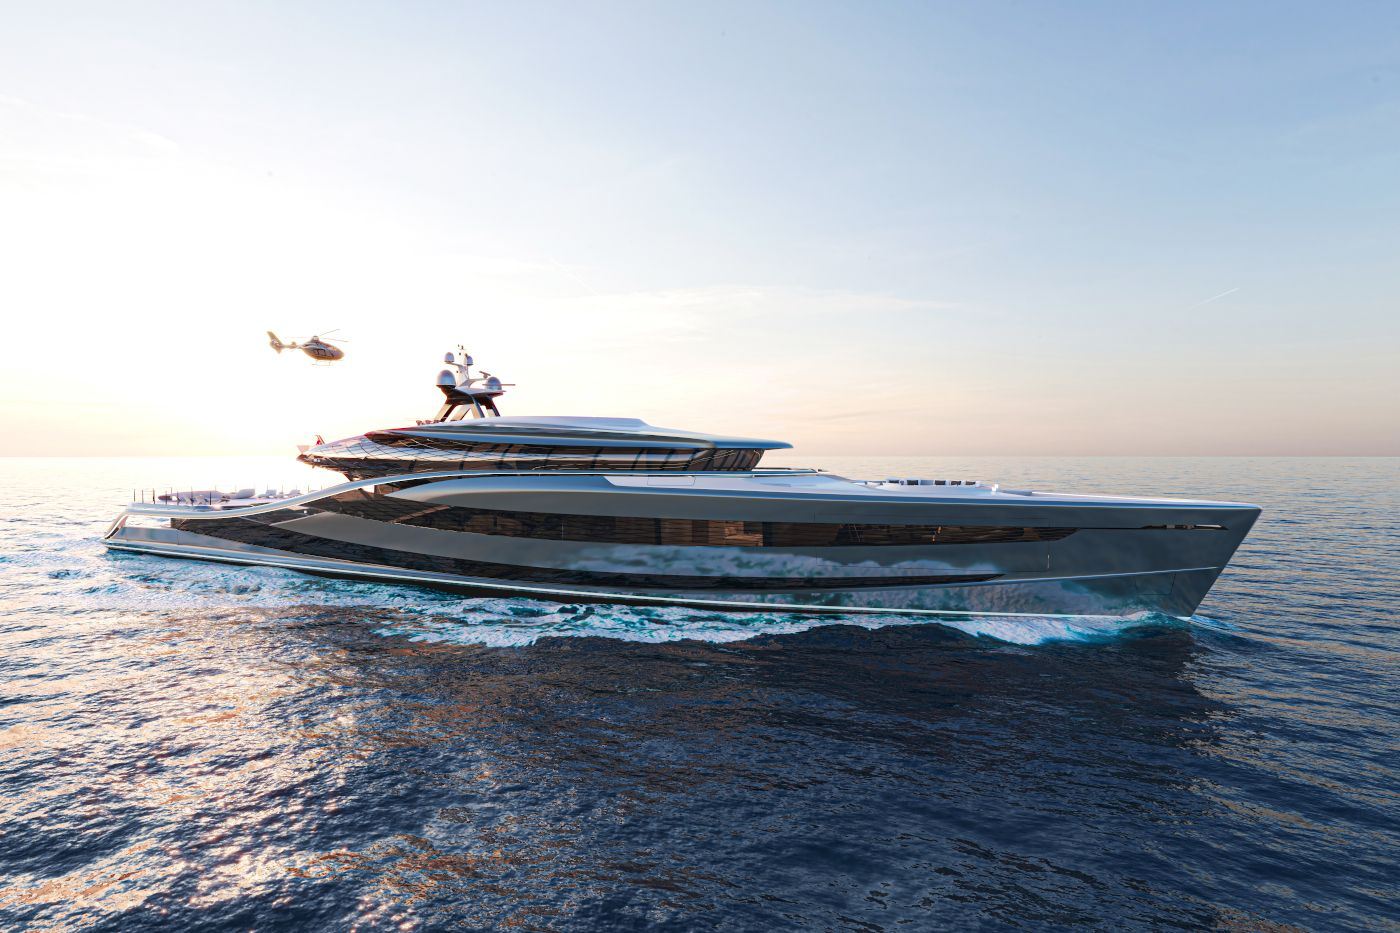 luxury yacht, yacht concept, yacht